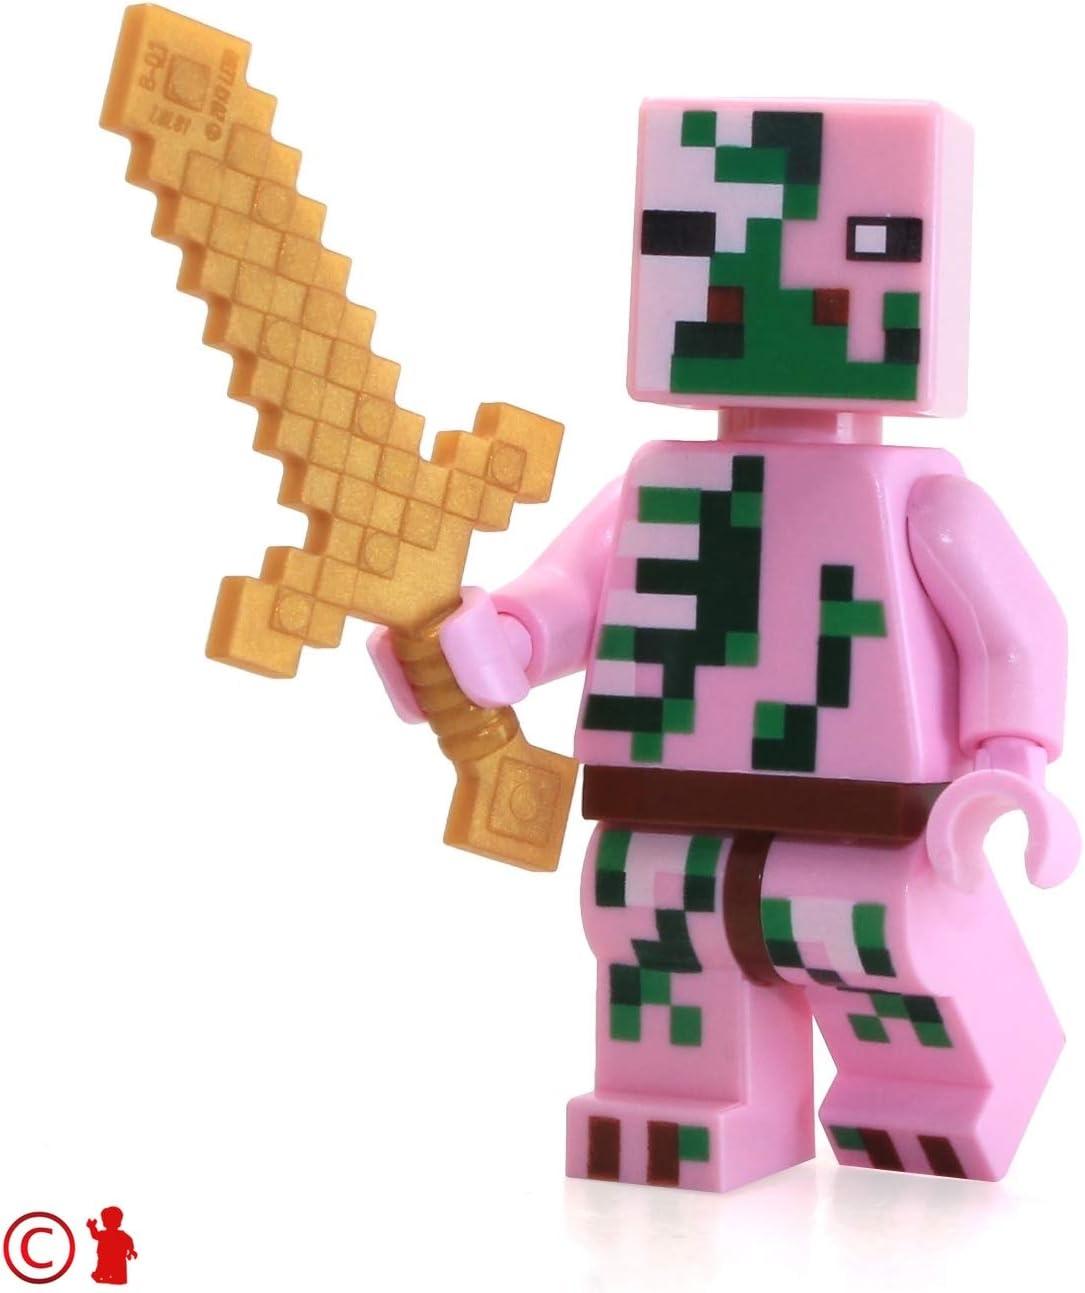 LEGO Minecraft MiniFigure - Nether Fortress Zombie Pigman Exclusive Minifigure